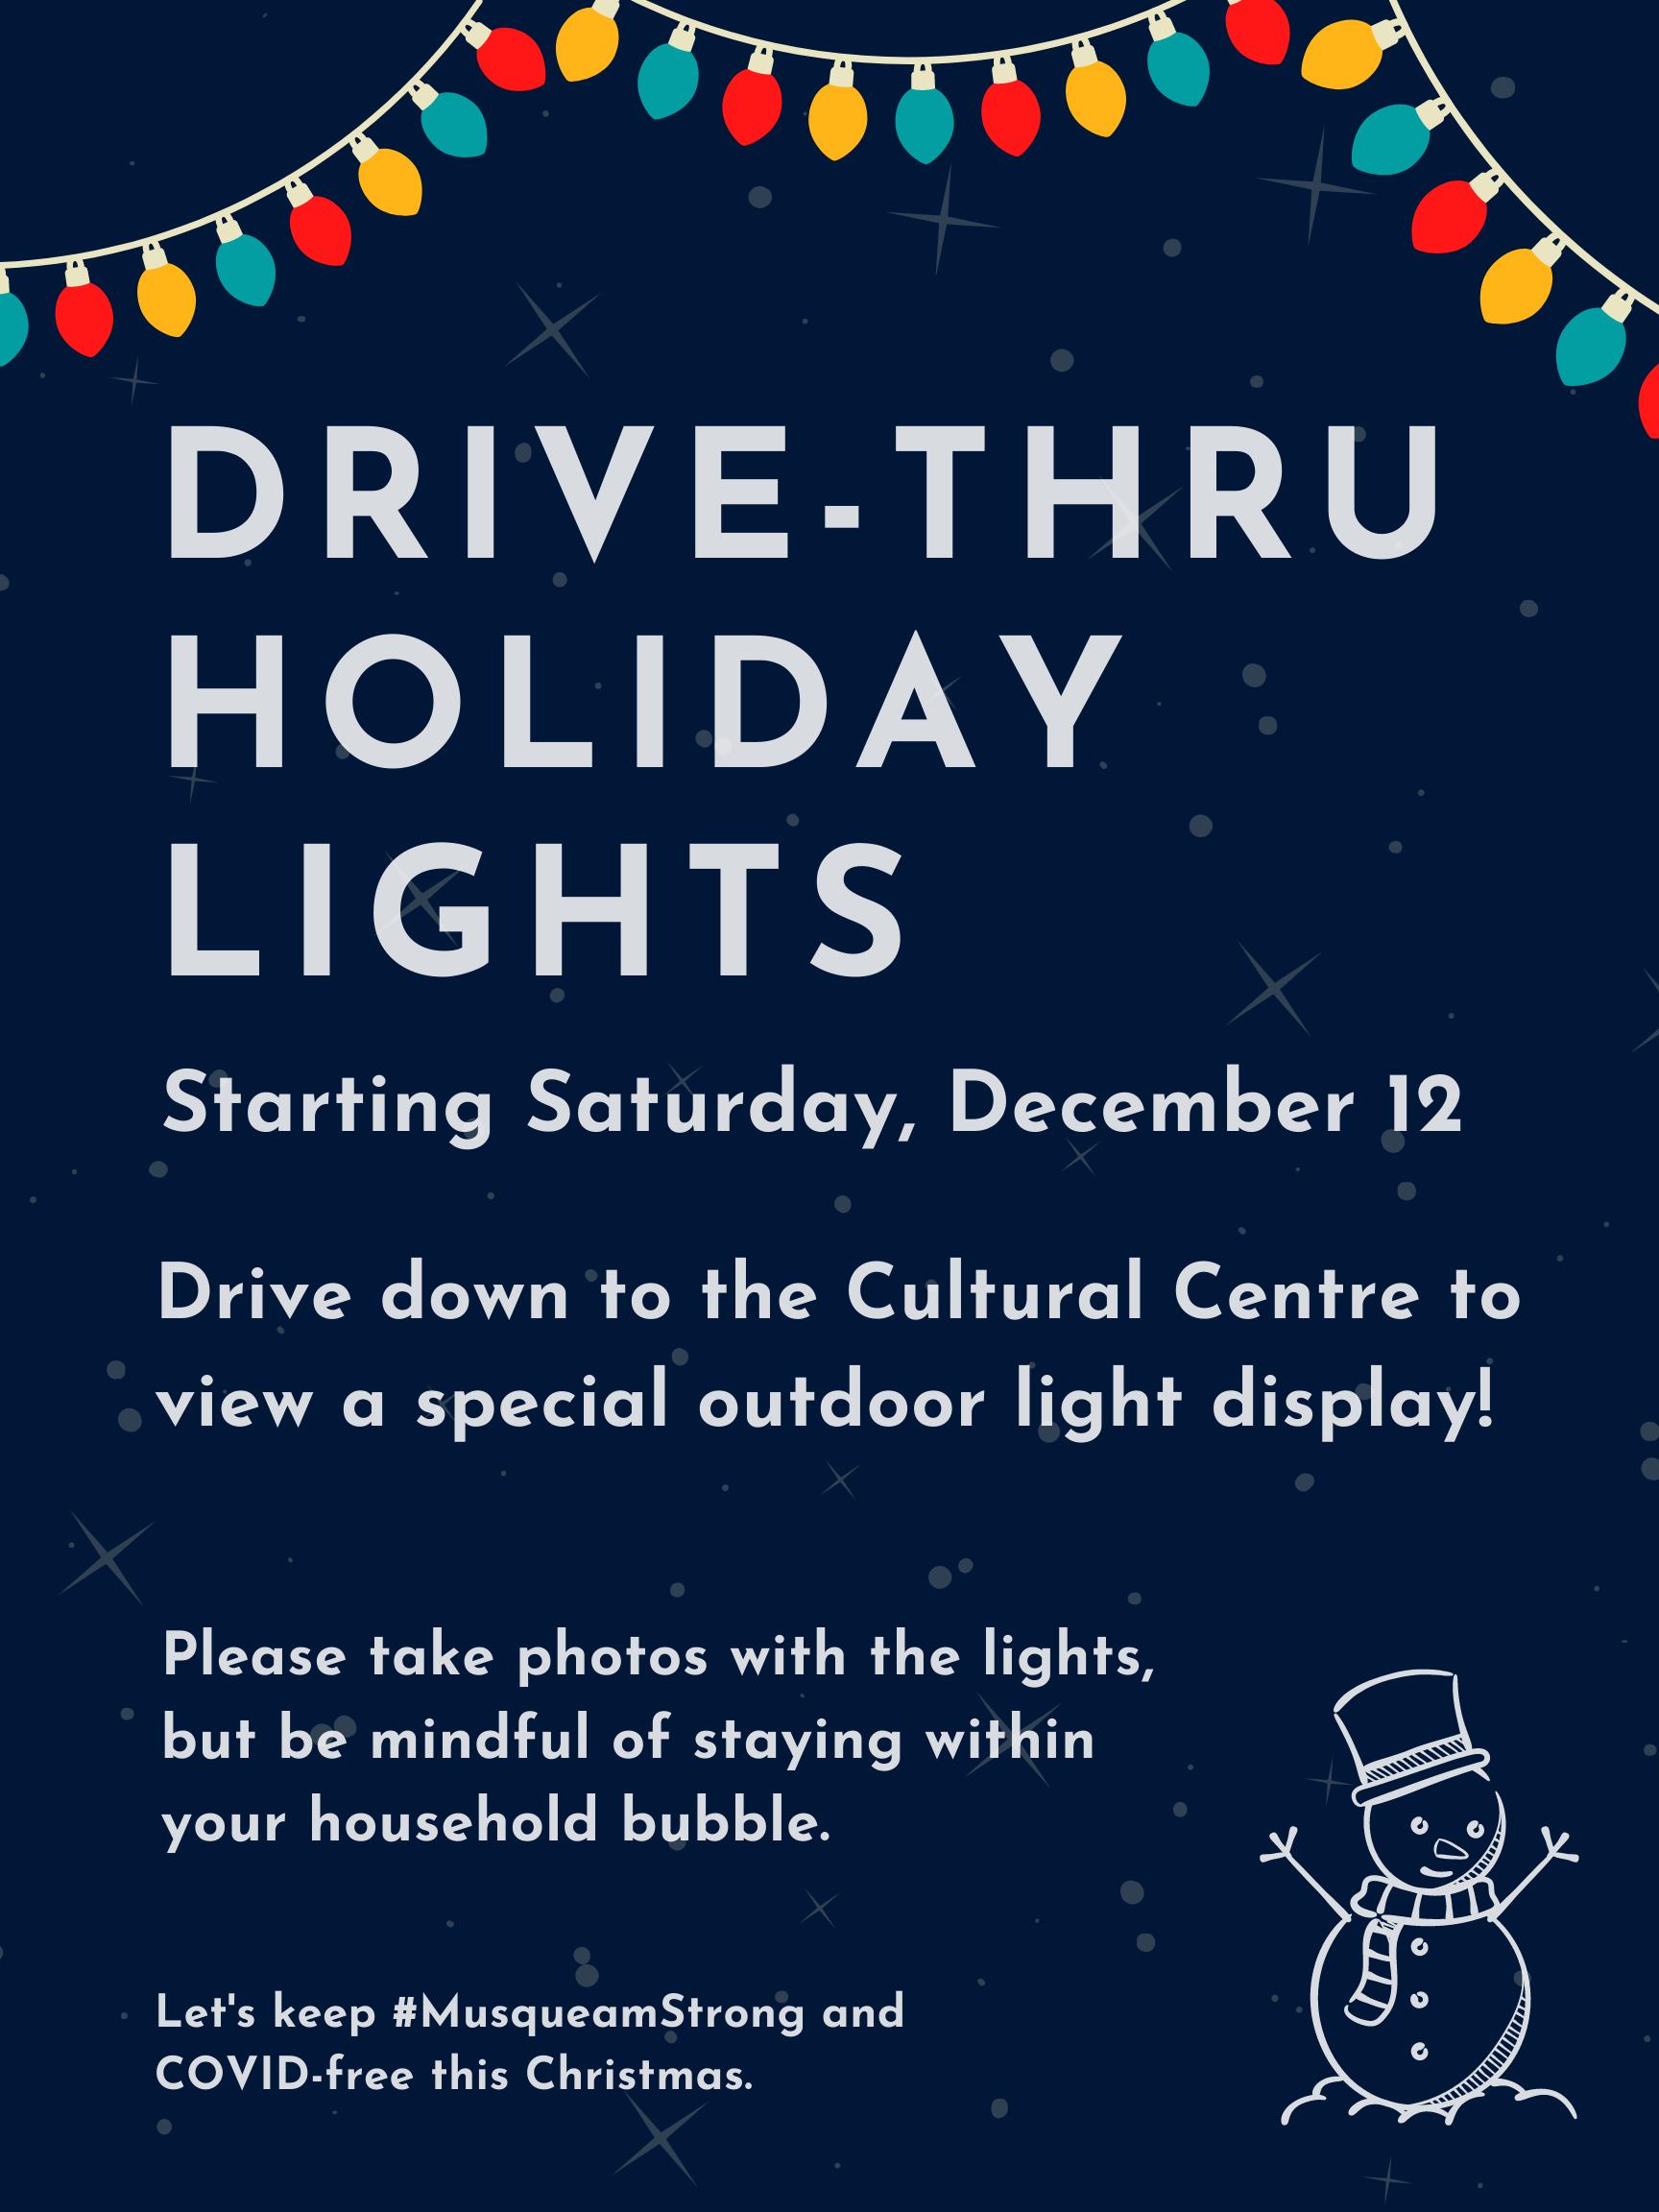 Drive thru holiday lights